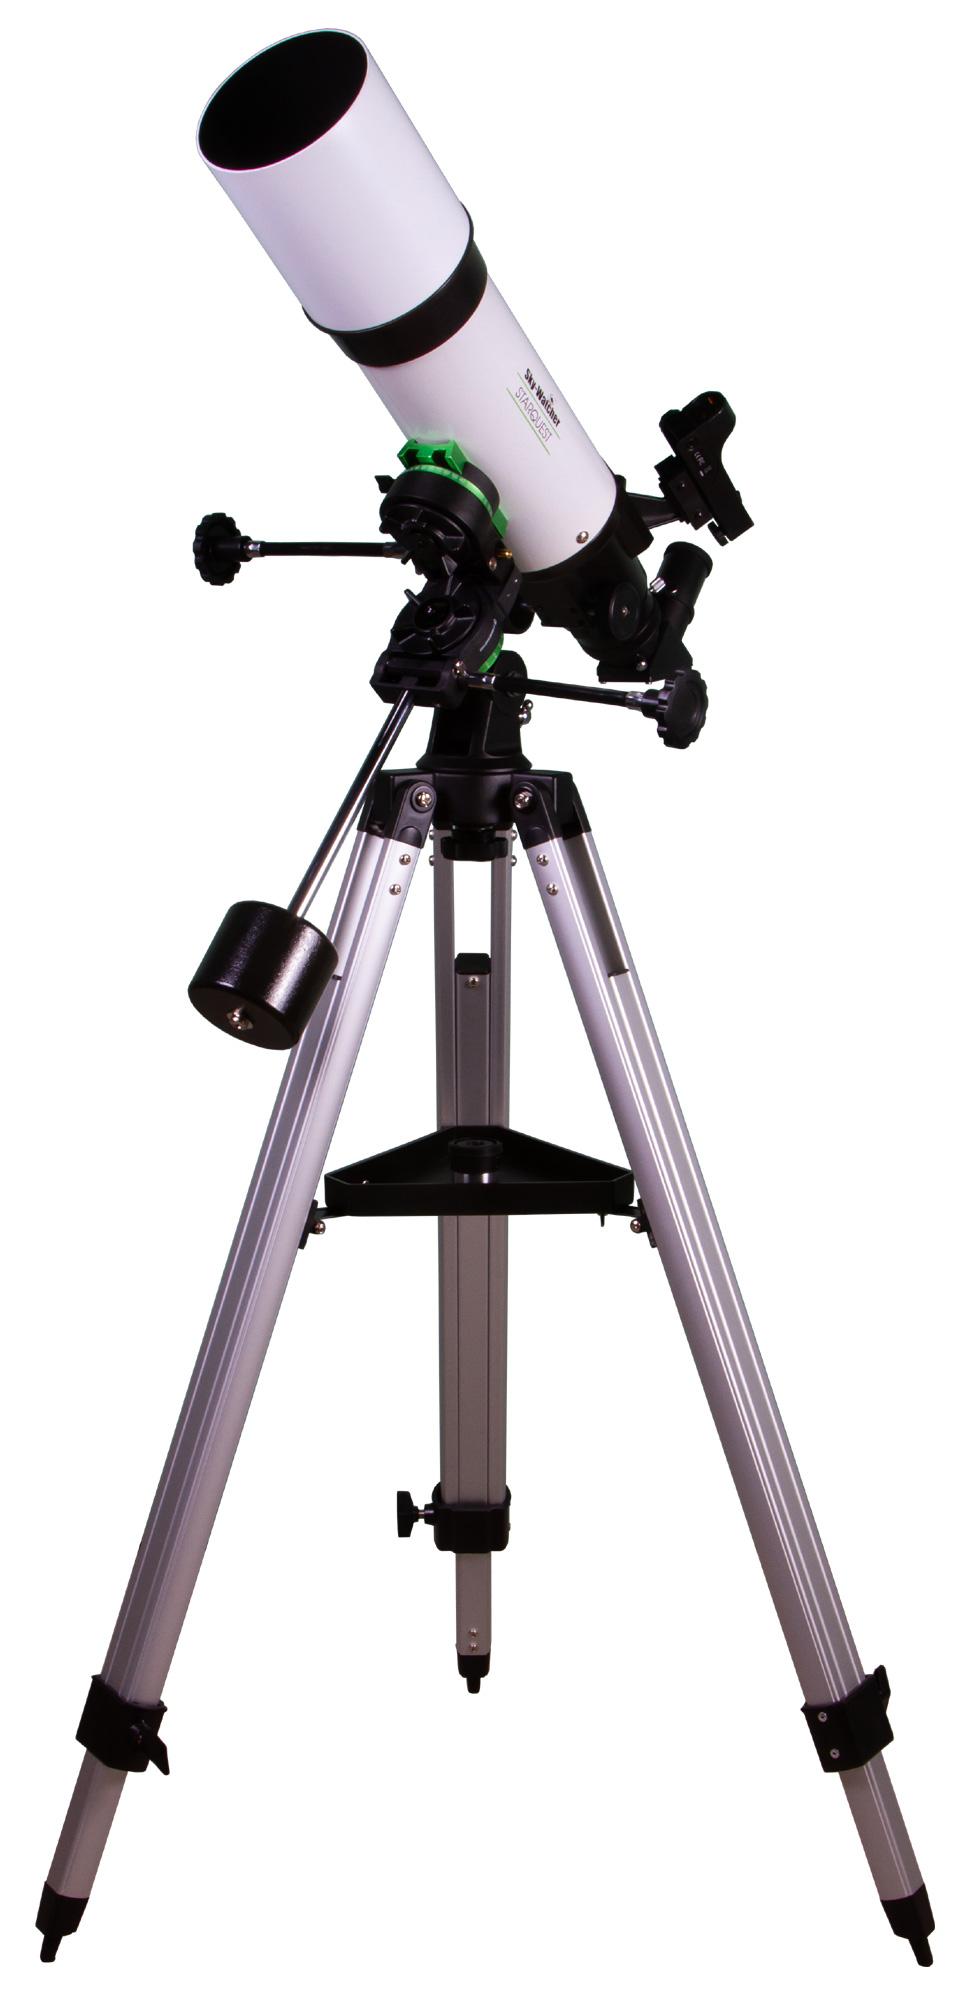 Картинка для Телескоп Sky-Watcher AC102/500 StarQuest EQ1